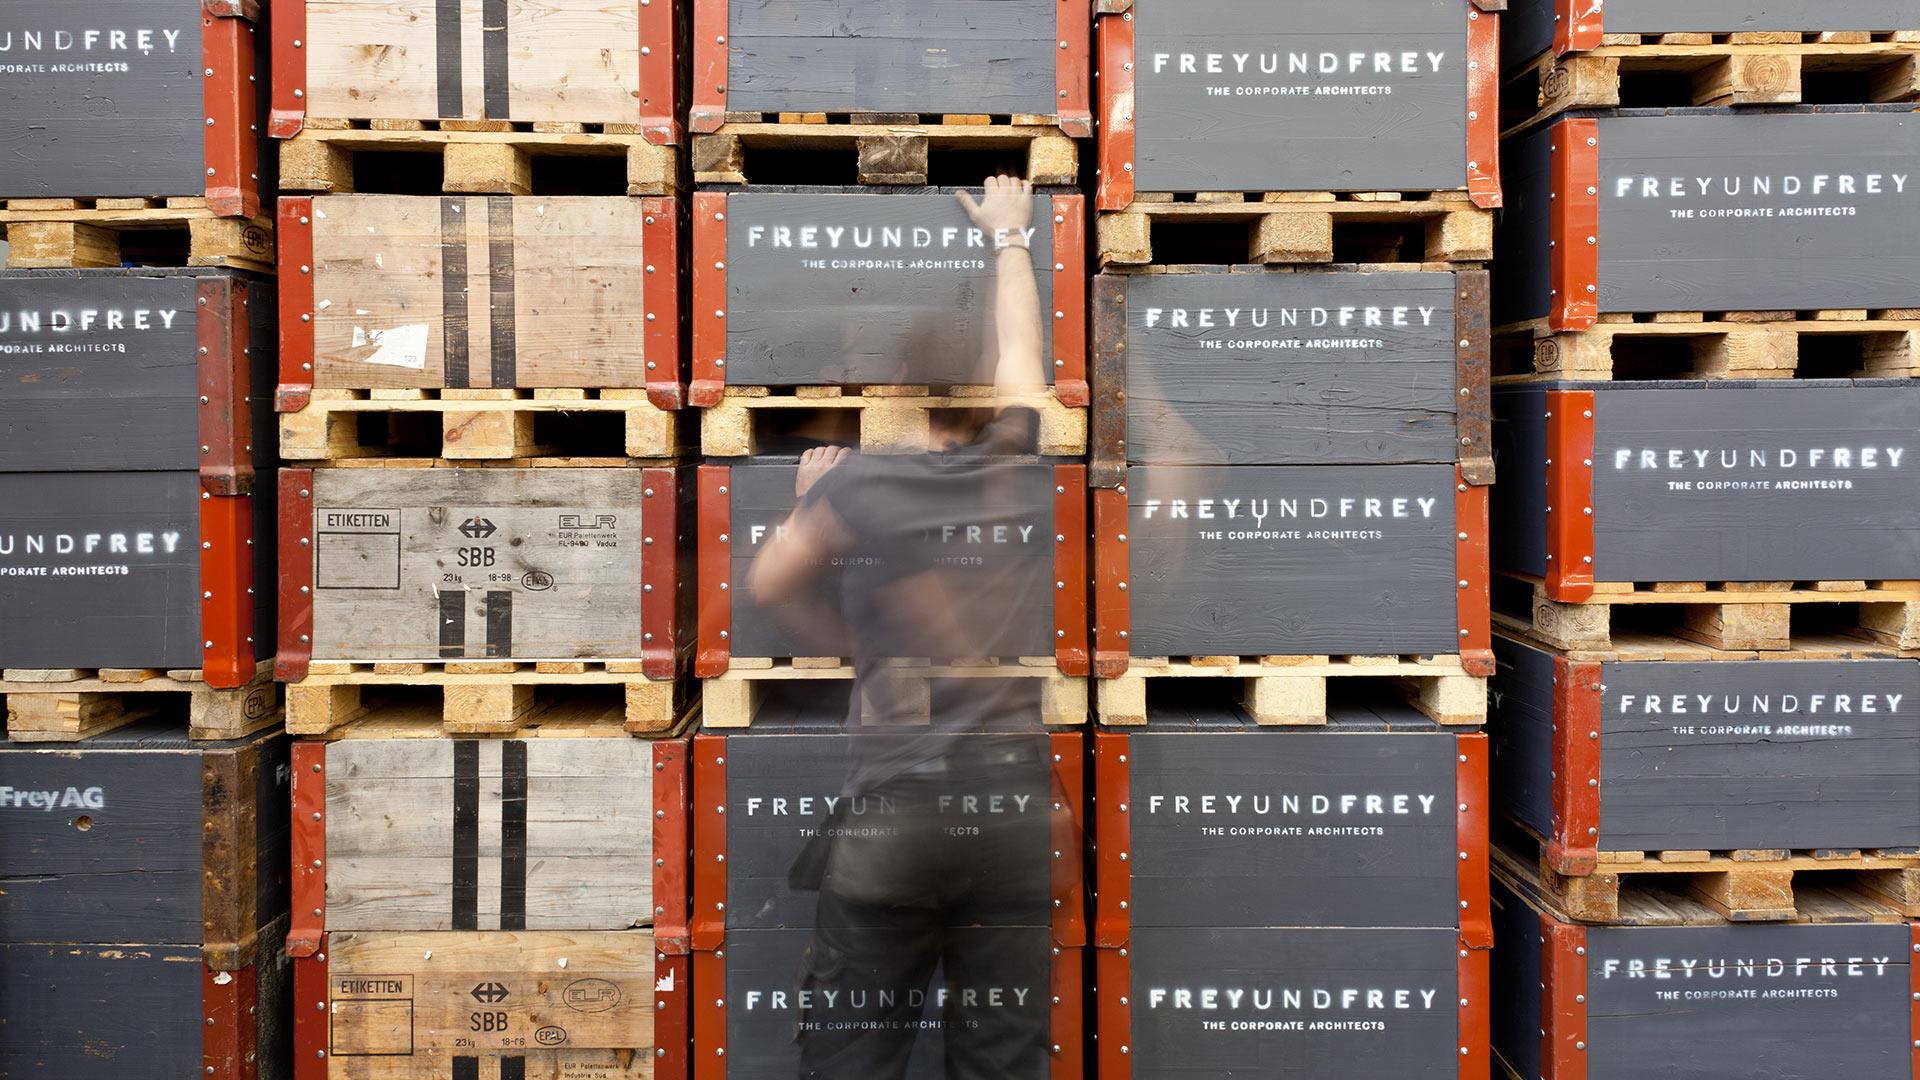 freyfrey_gebaeude_logistik